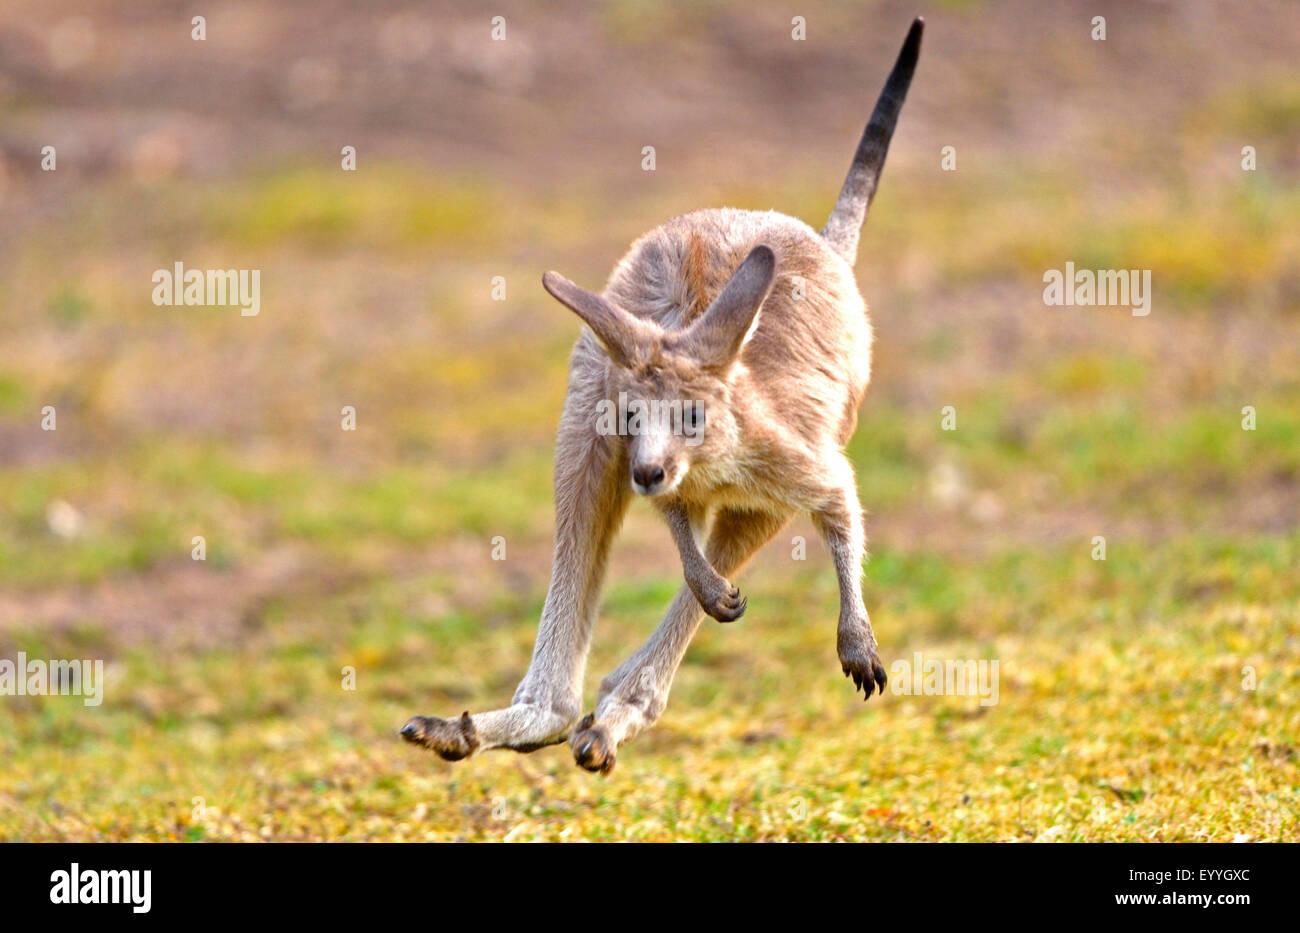 eastern gray kangaroo (Macropus giganteus), juvenile in a meadow - Stock Image